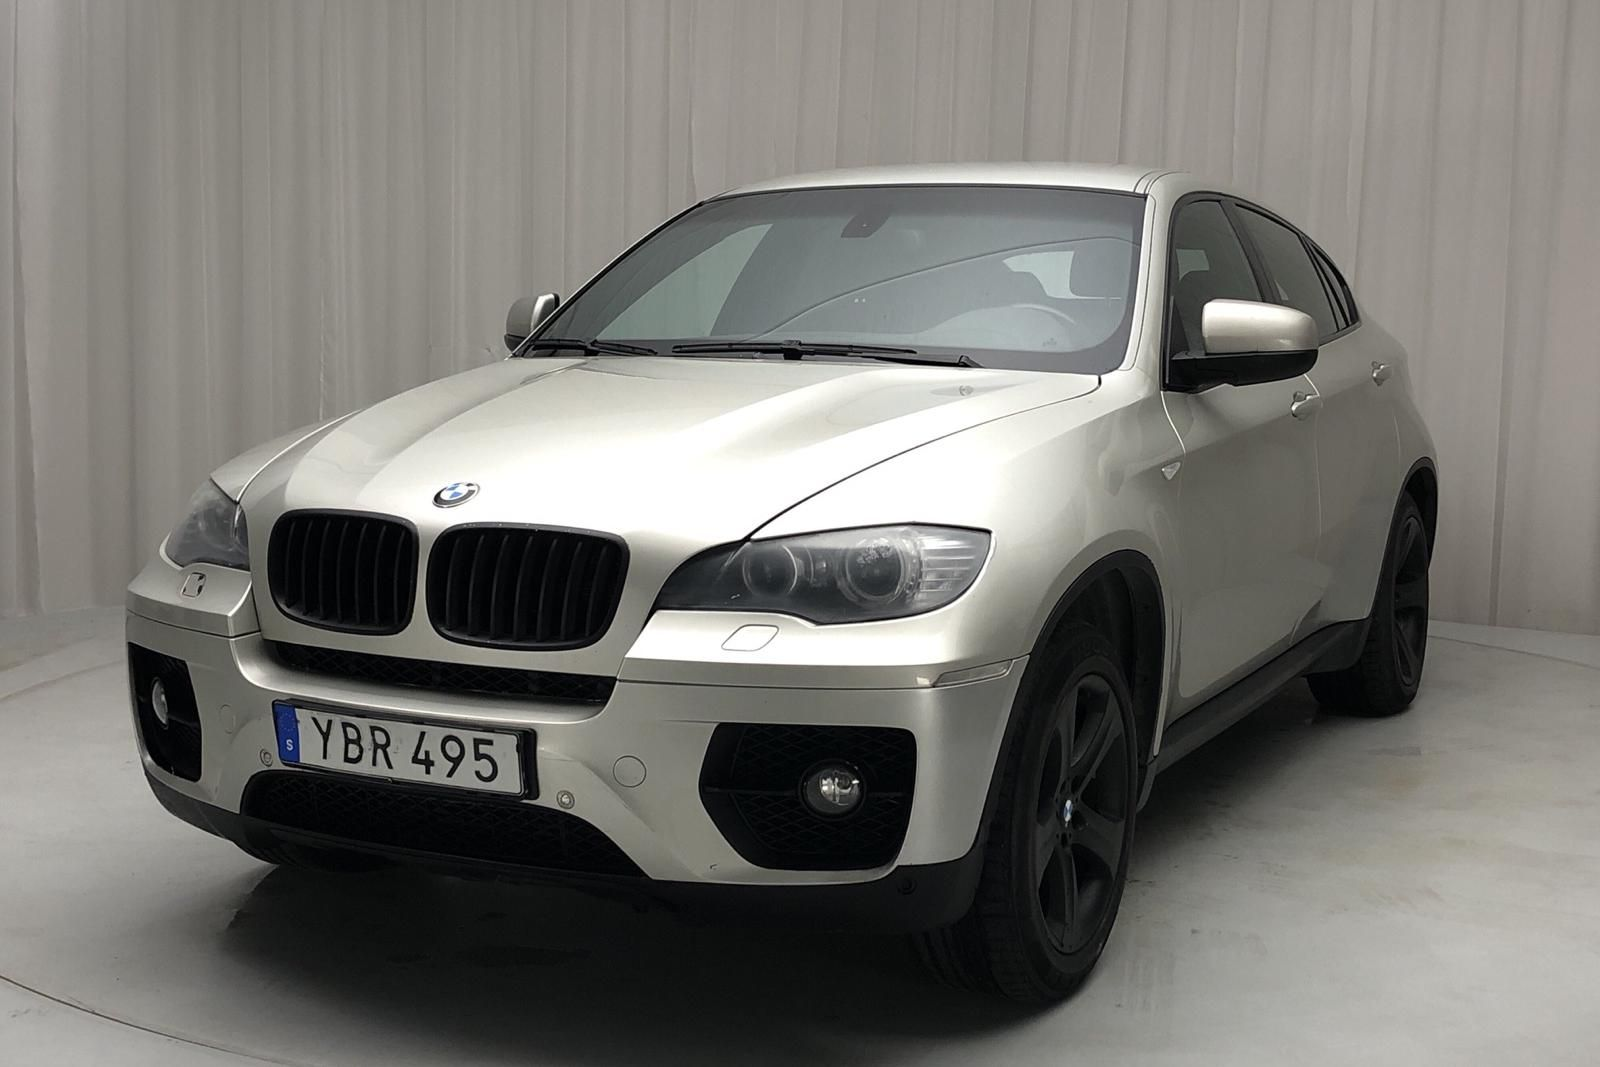 BMW X6 35i, E71 (306 PS)